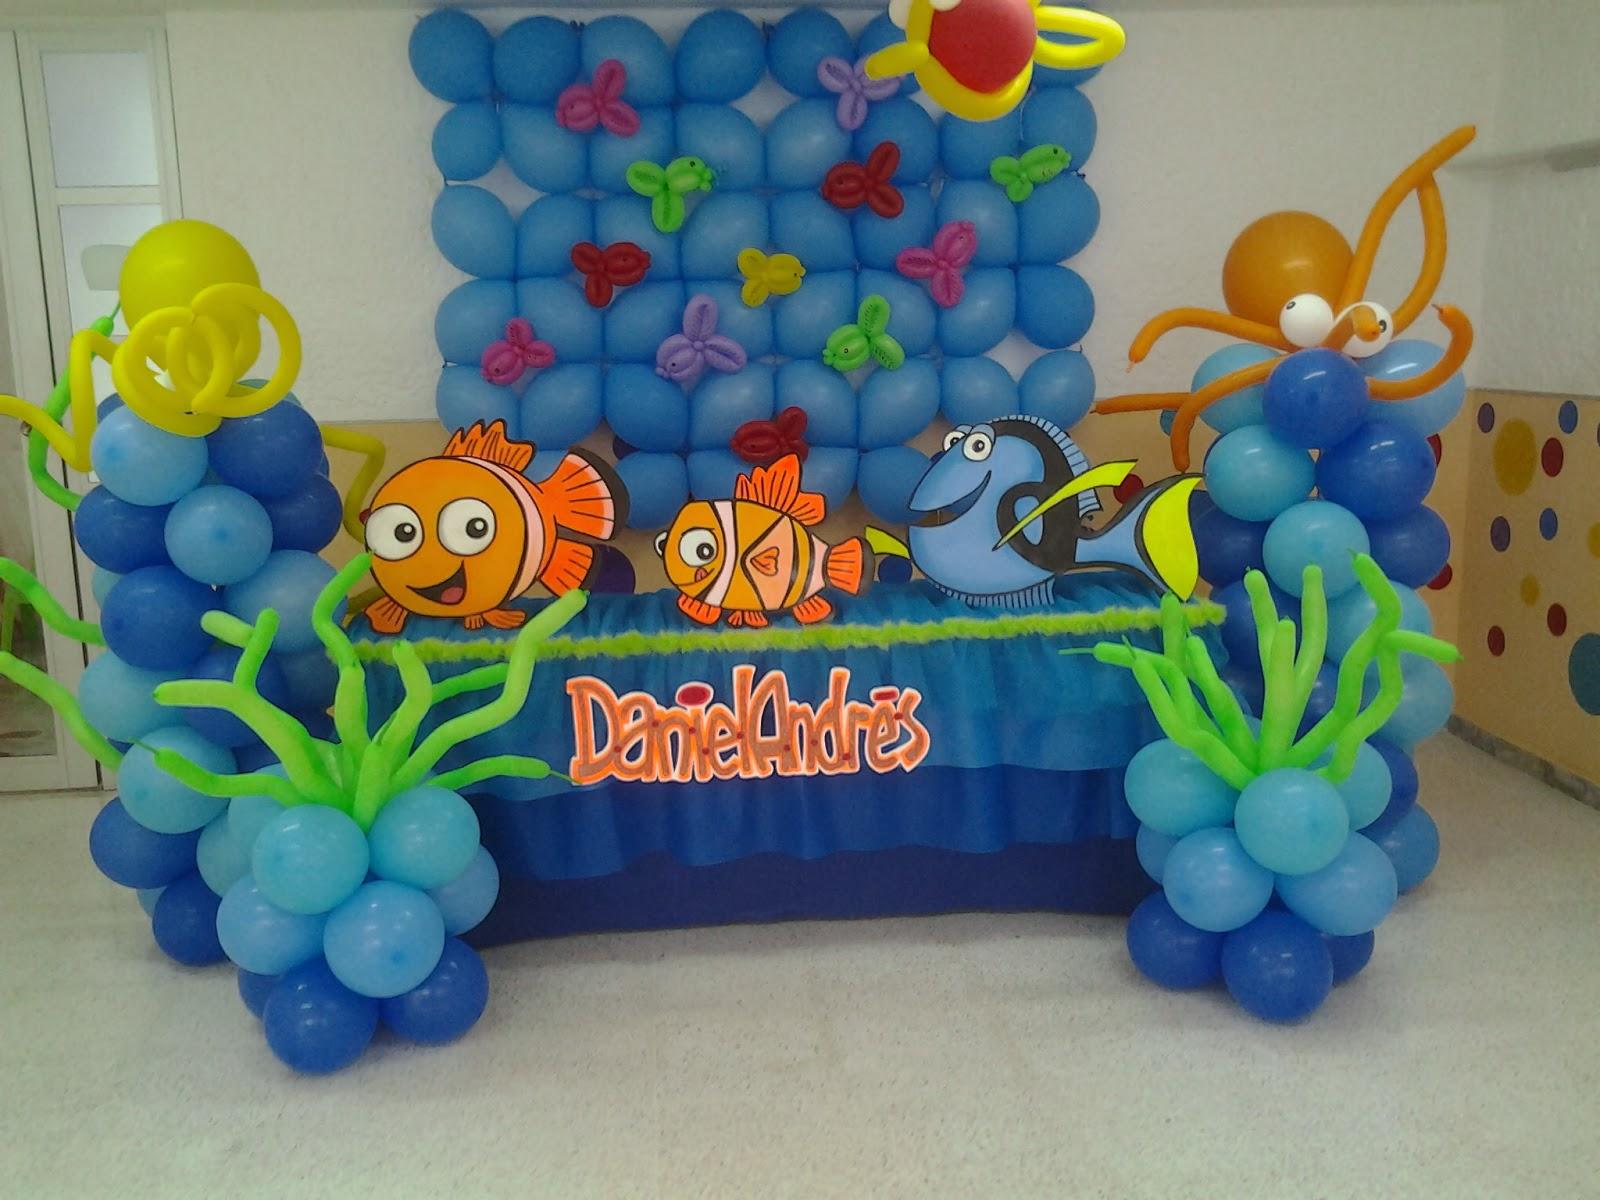 Decoraciones de nemo para cumplea os 26 decoracion de for Decoracion para pared de cumpleanos